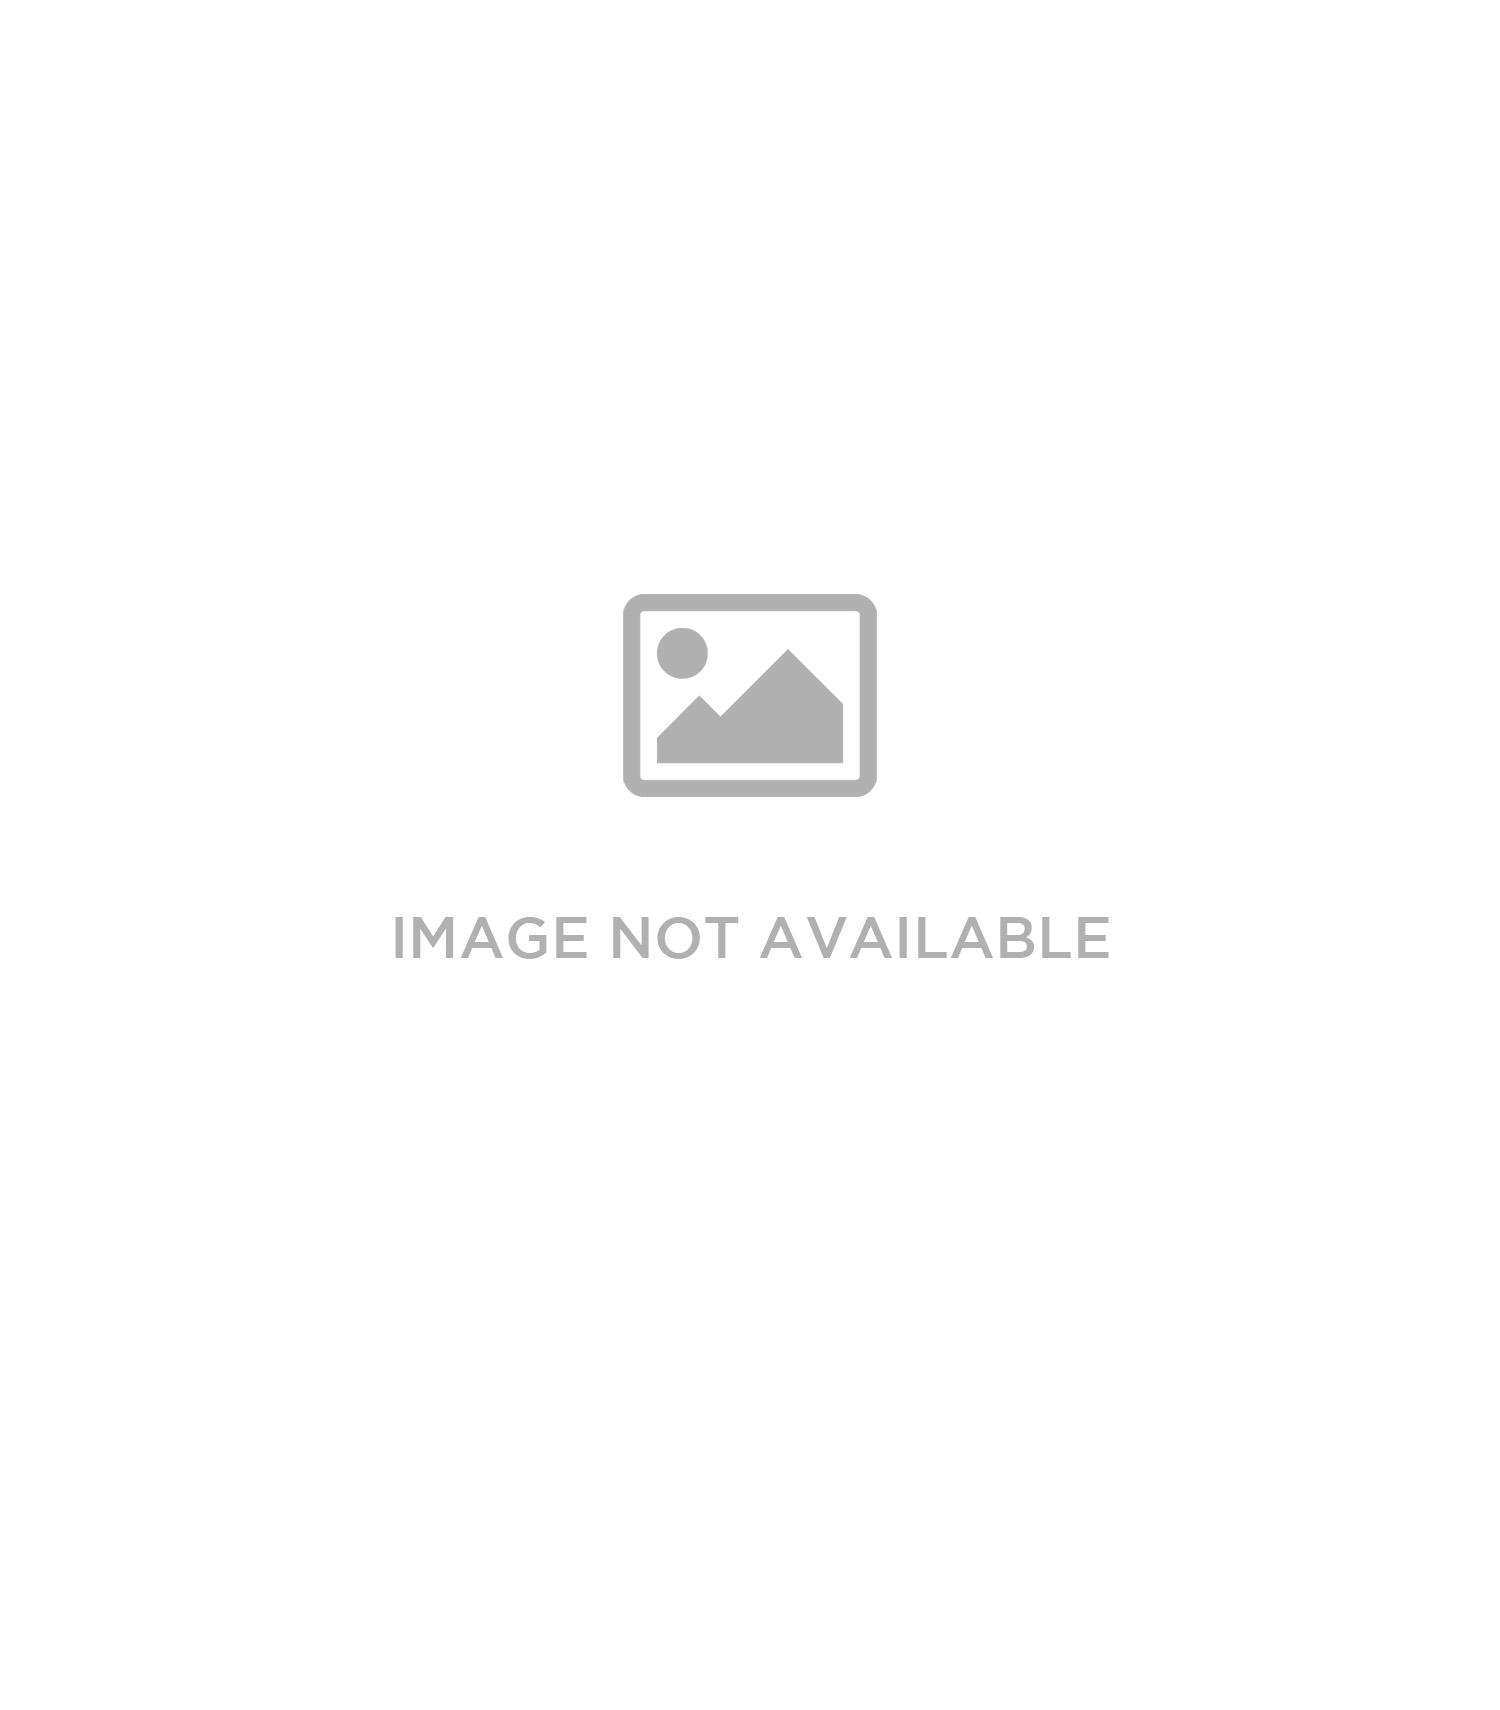 15e5a3c77 YUPOONG® LOW PROFILE COTTON TWILL DAD CAP. ATC6245CM - ATC™ by ...